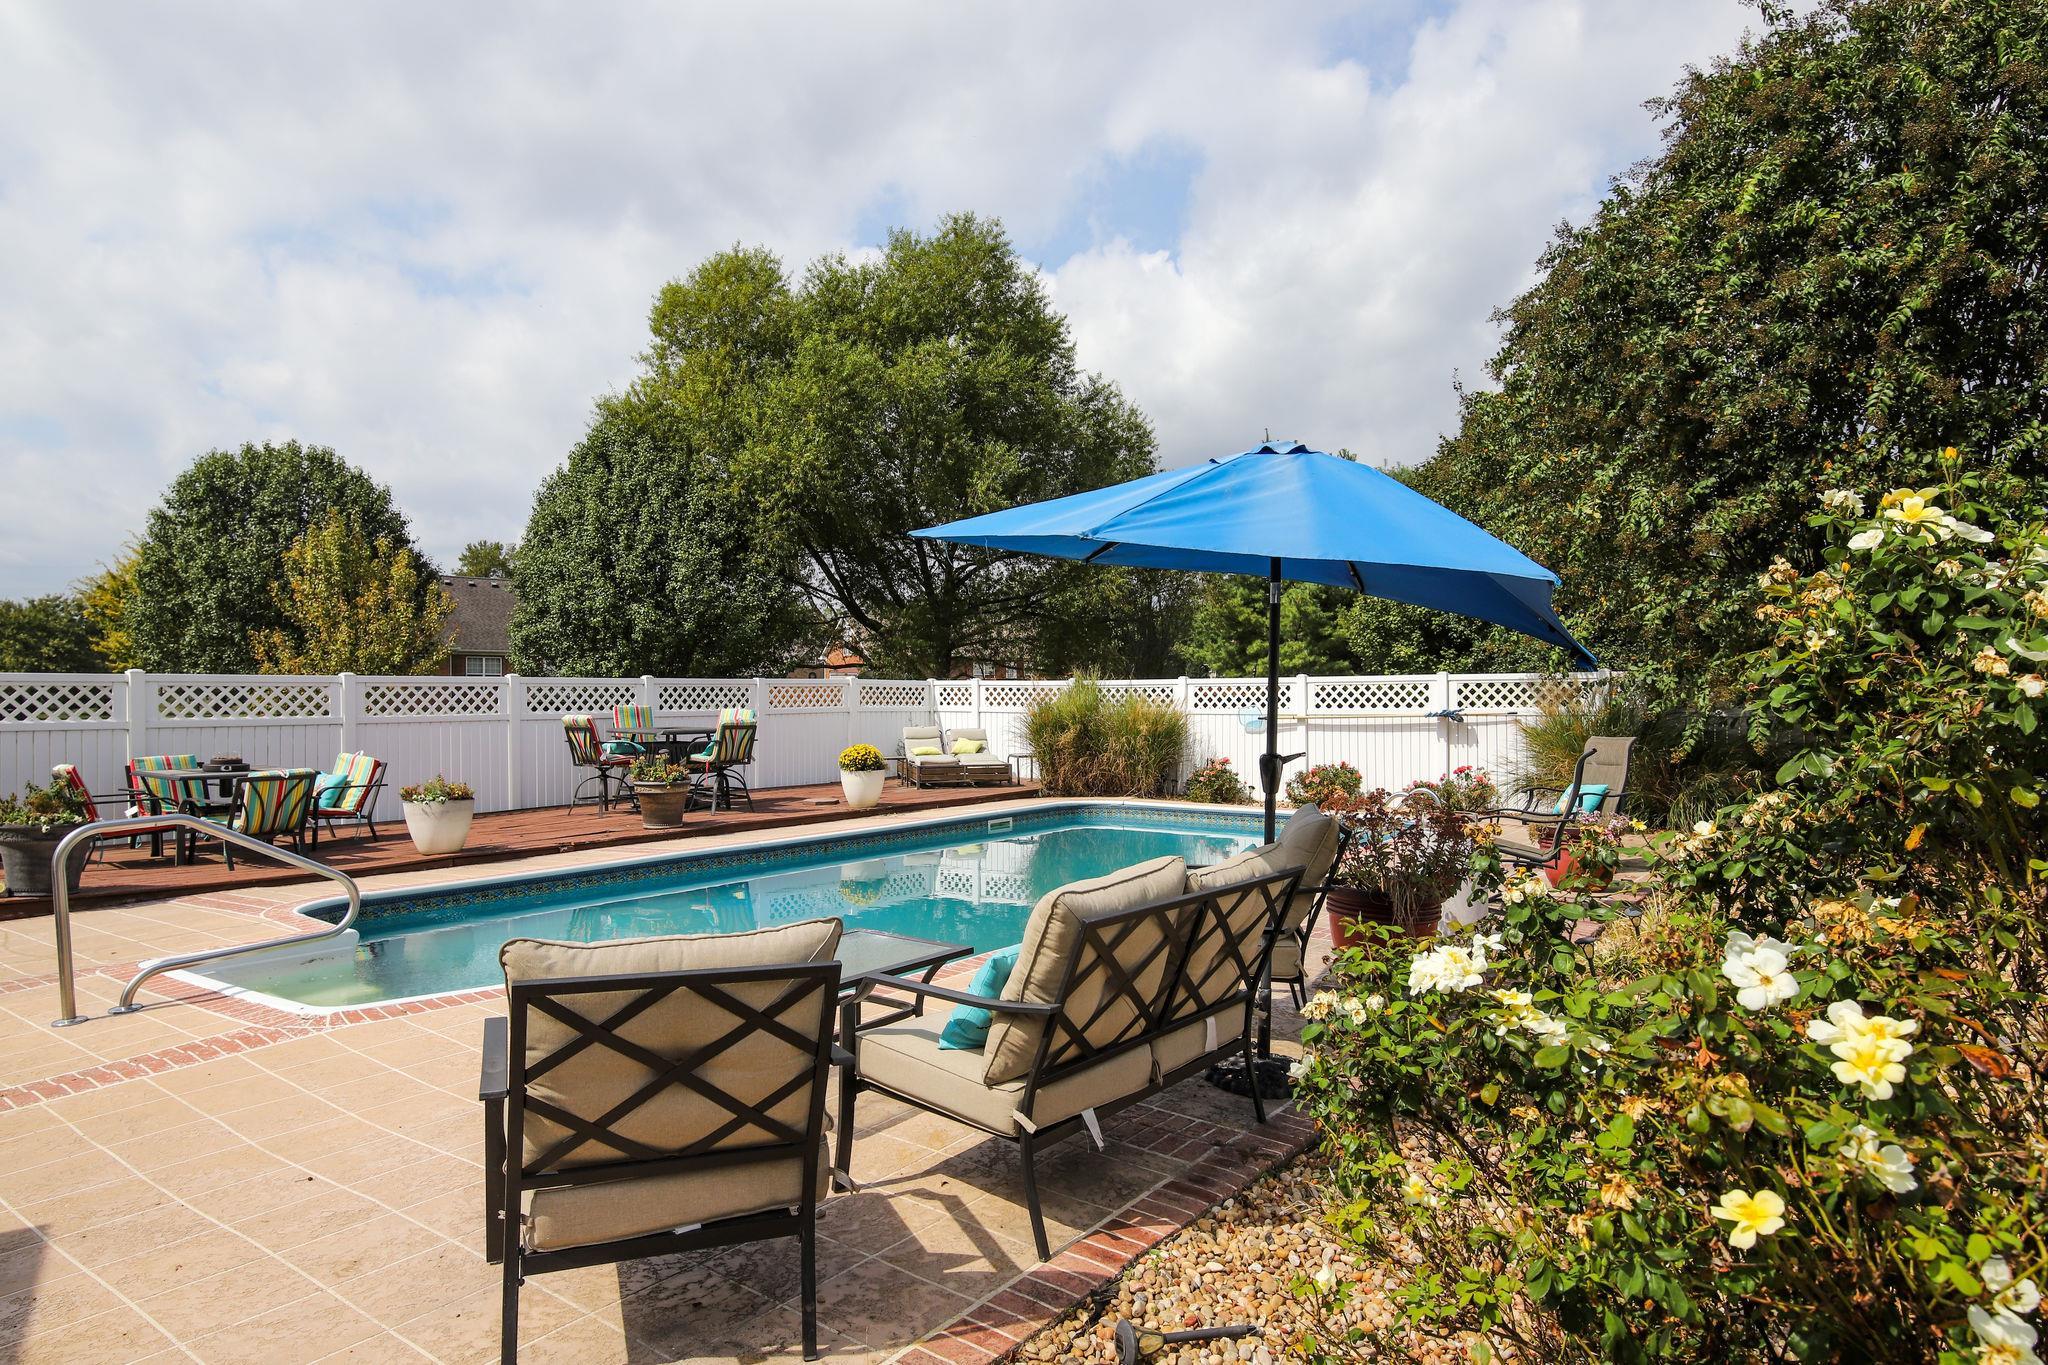 $329,900 - 4Br/3Ba -  for Sale in Lyon Crest Estates Sec 2, Portland